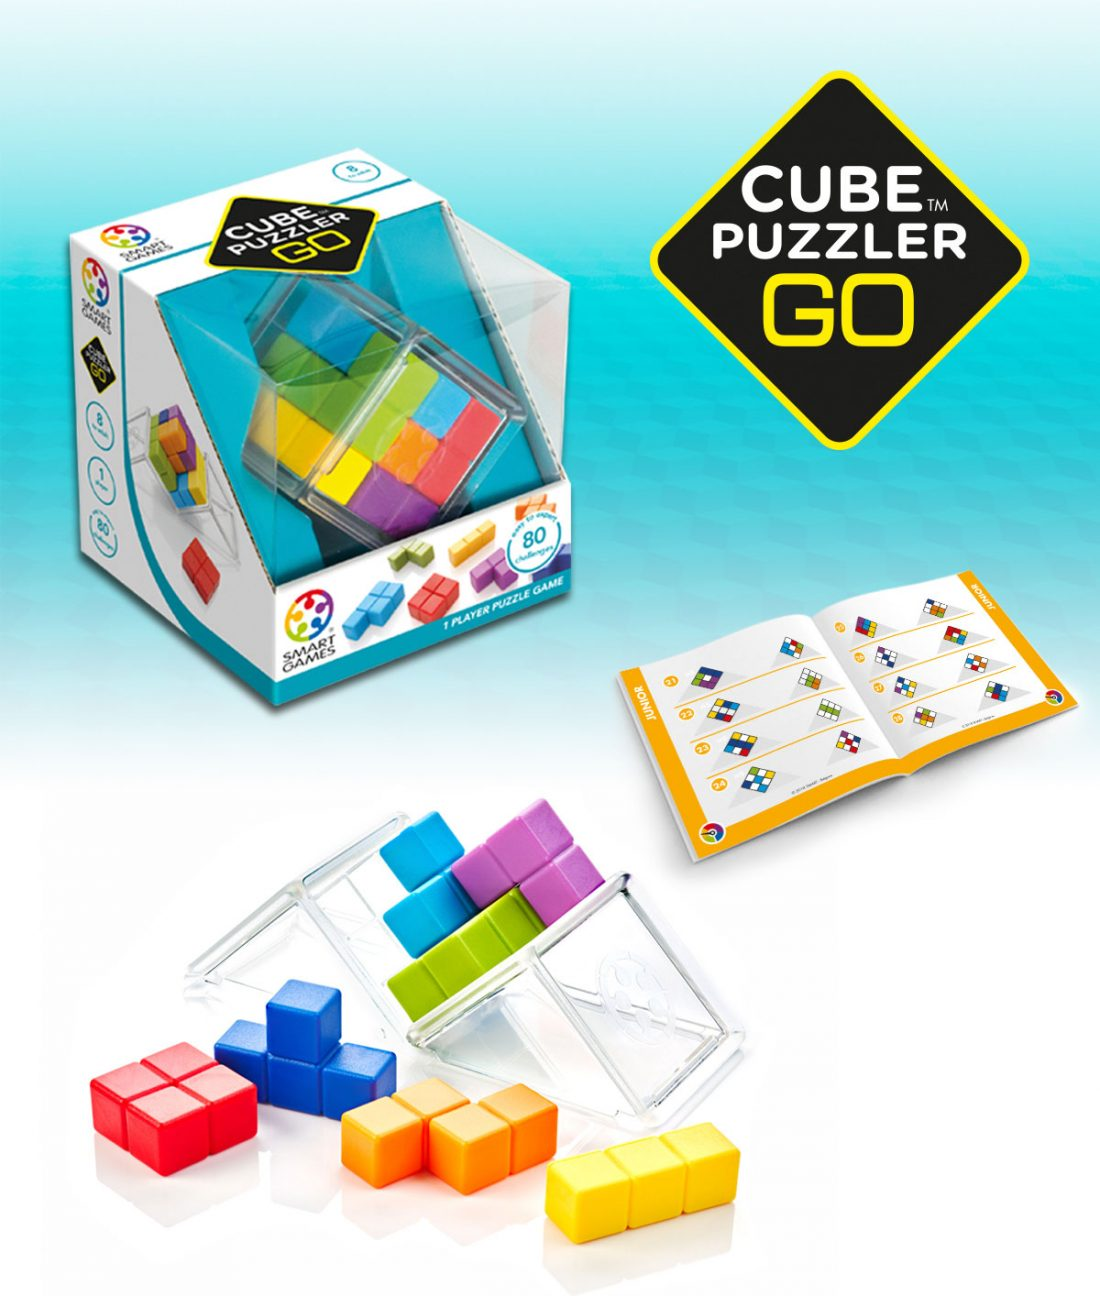 Edu-taining SmartGames Sleeping Beauty, Cube Puzzler GO and Cube